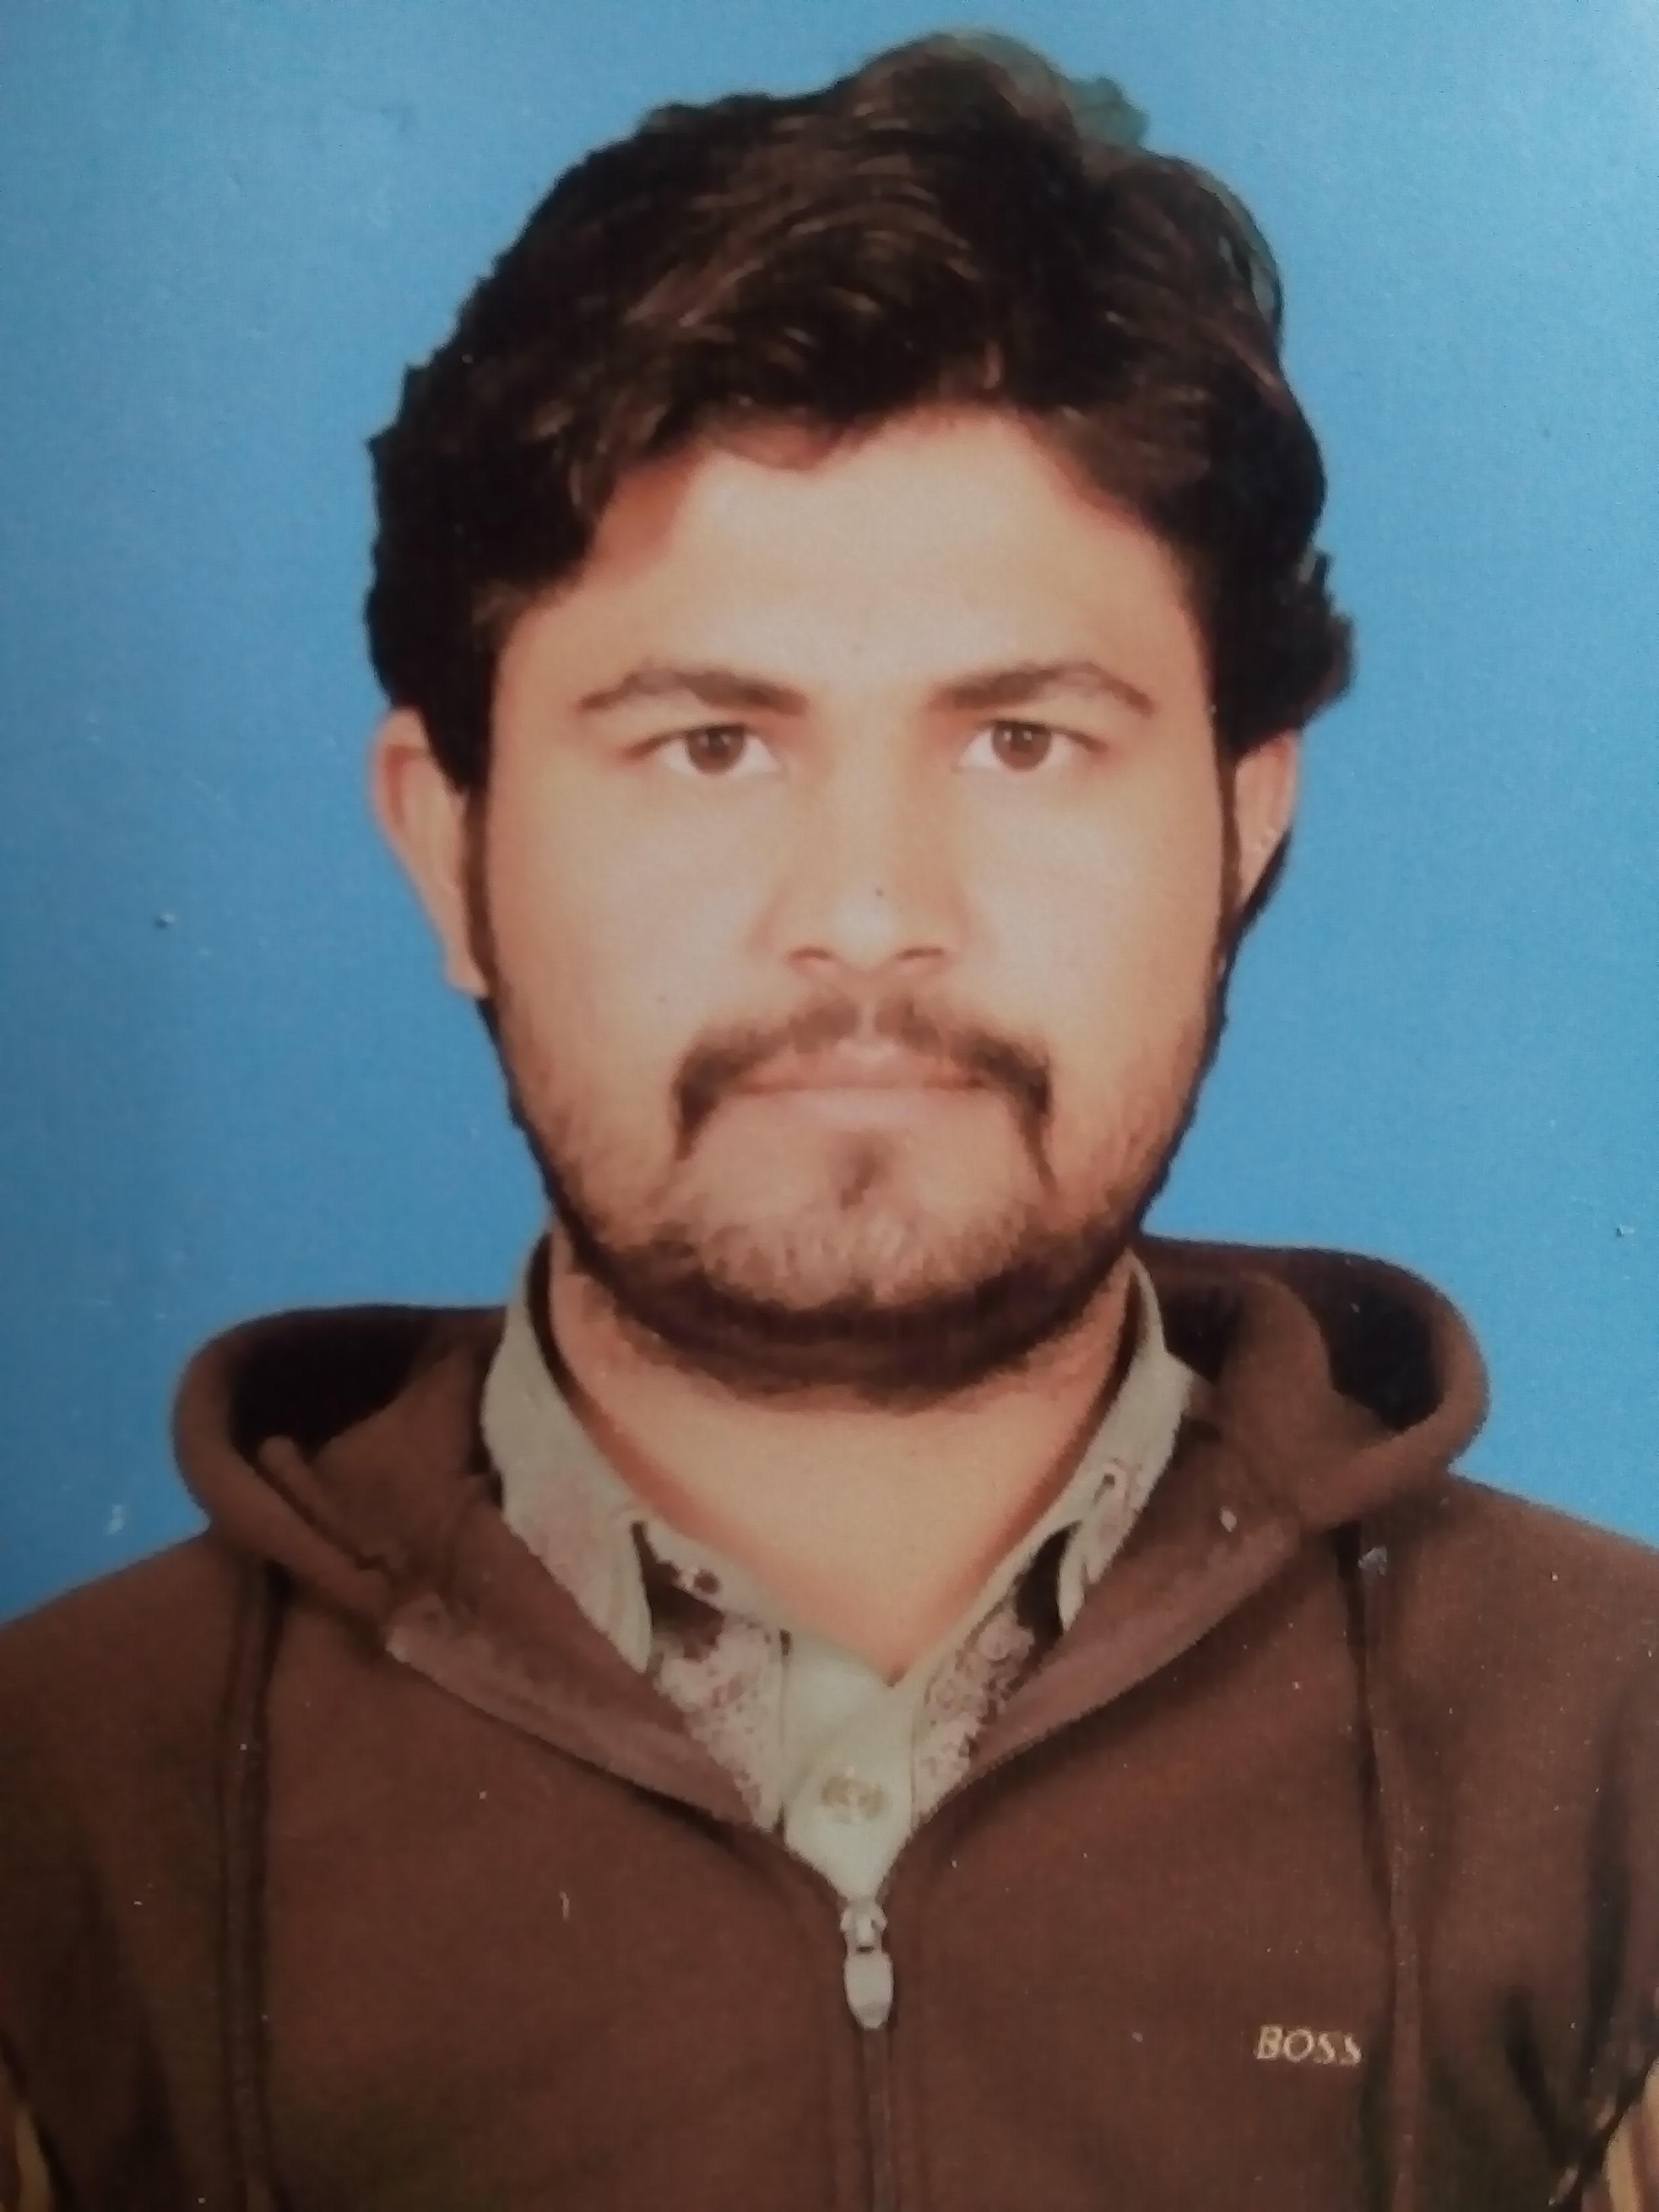 Haider Abbas Engineering, Electrical Engineering, Electronics, Circuit Design, Industrial Engineering